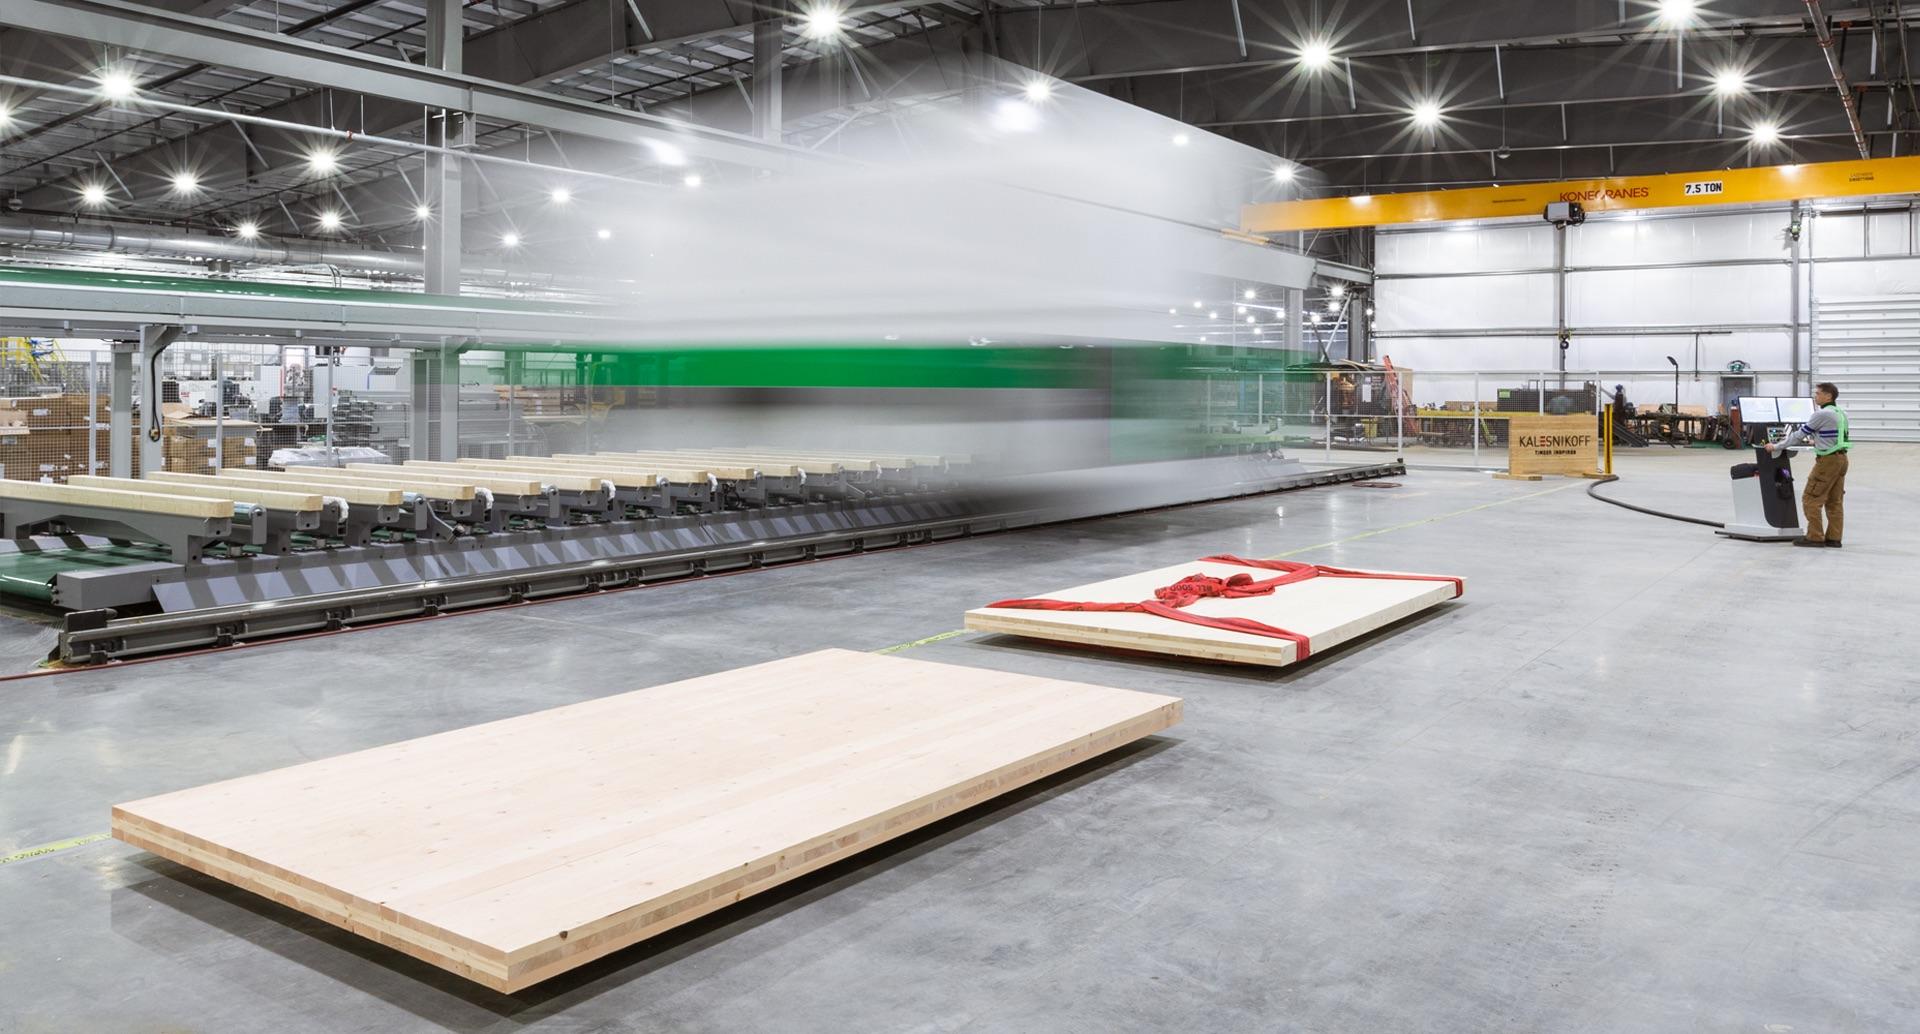 Kalesnikoff mass timber facility showing CNC machine and glulam panels (GLT) made of cross laminated timber